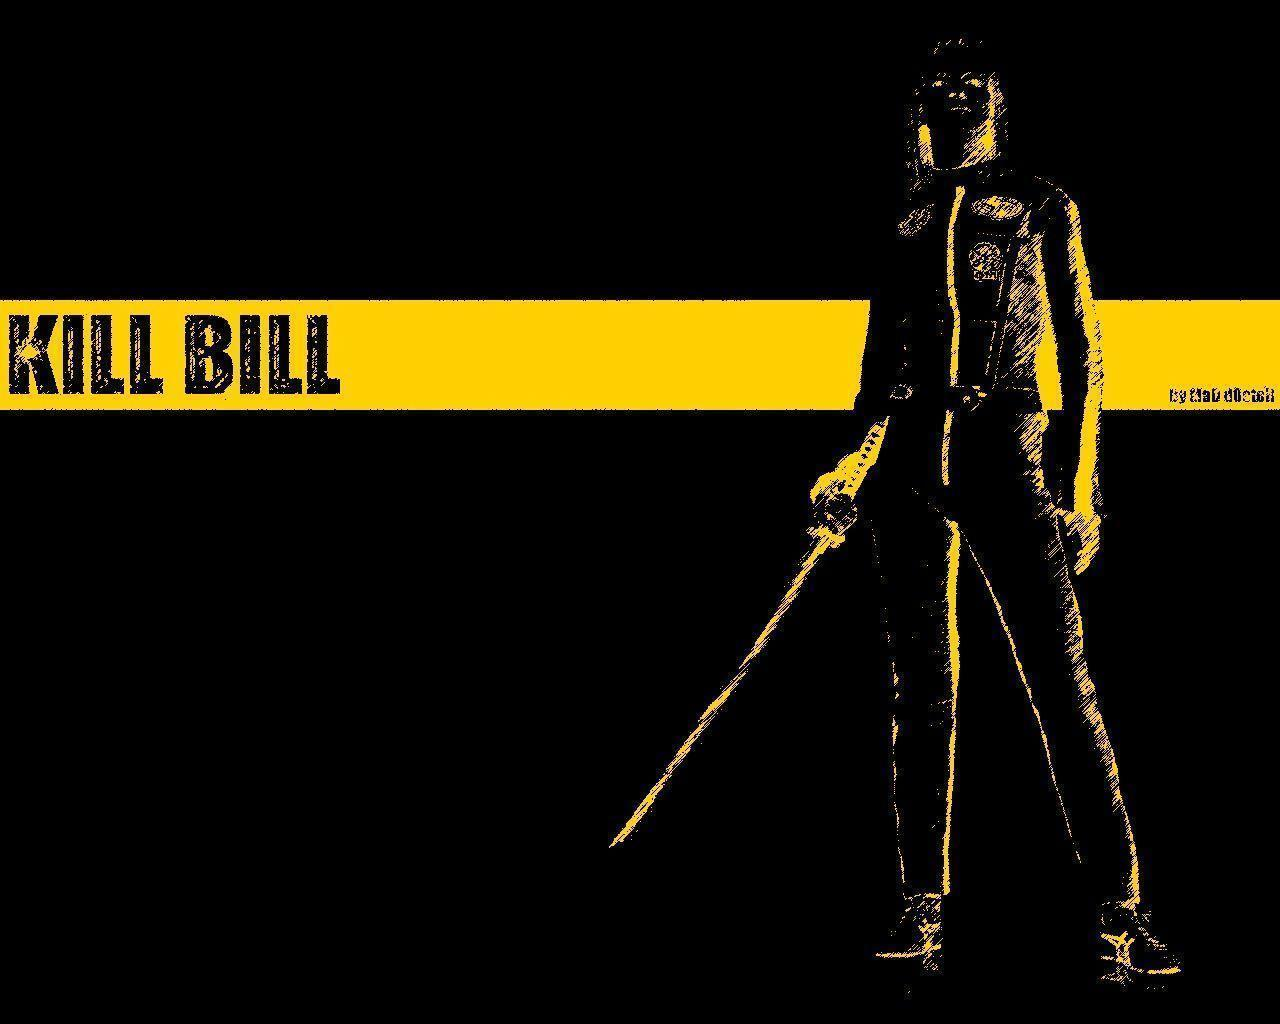 Kill Bill Wallpapers - Wallpaper Cave